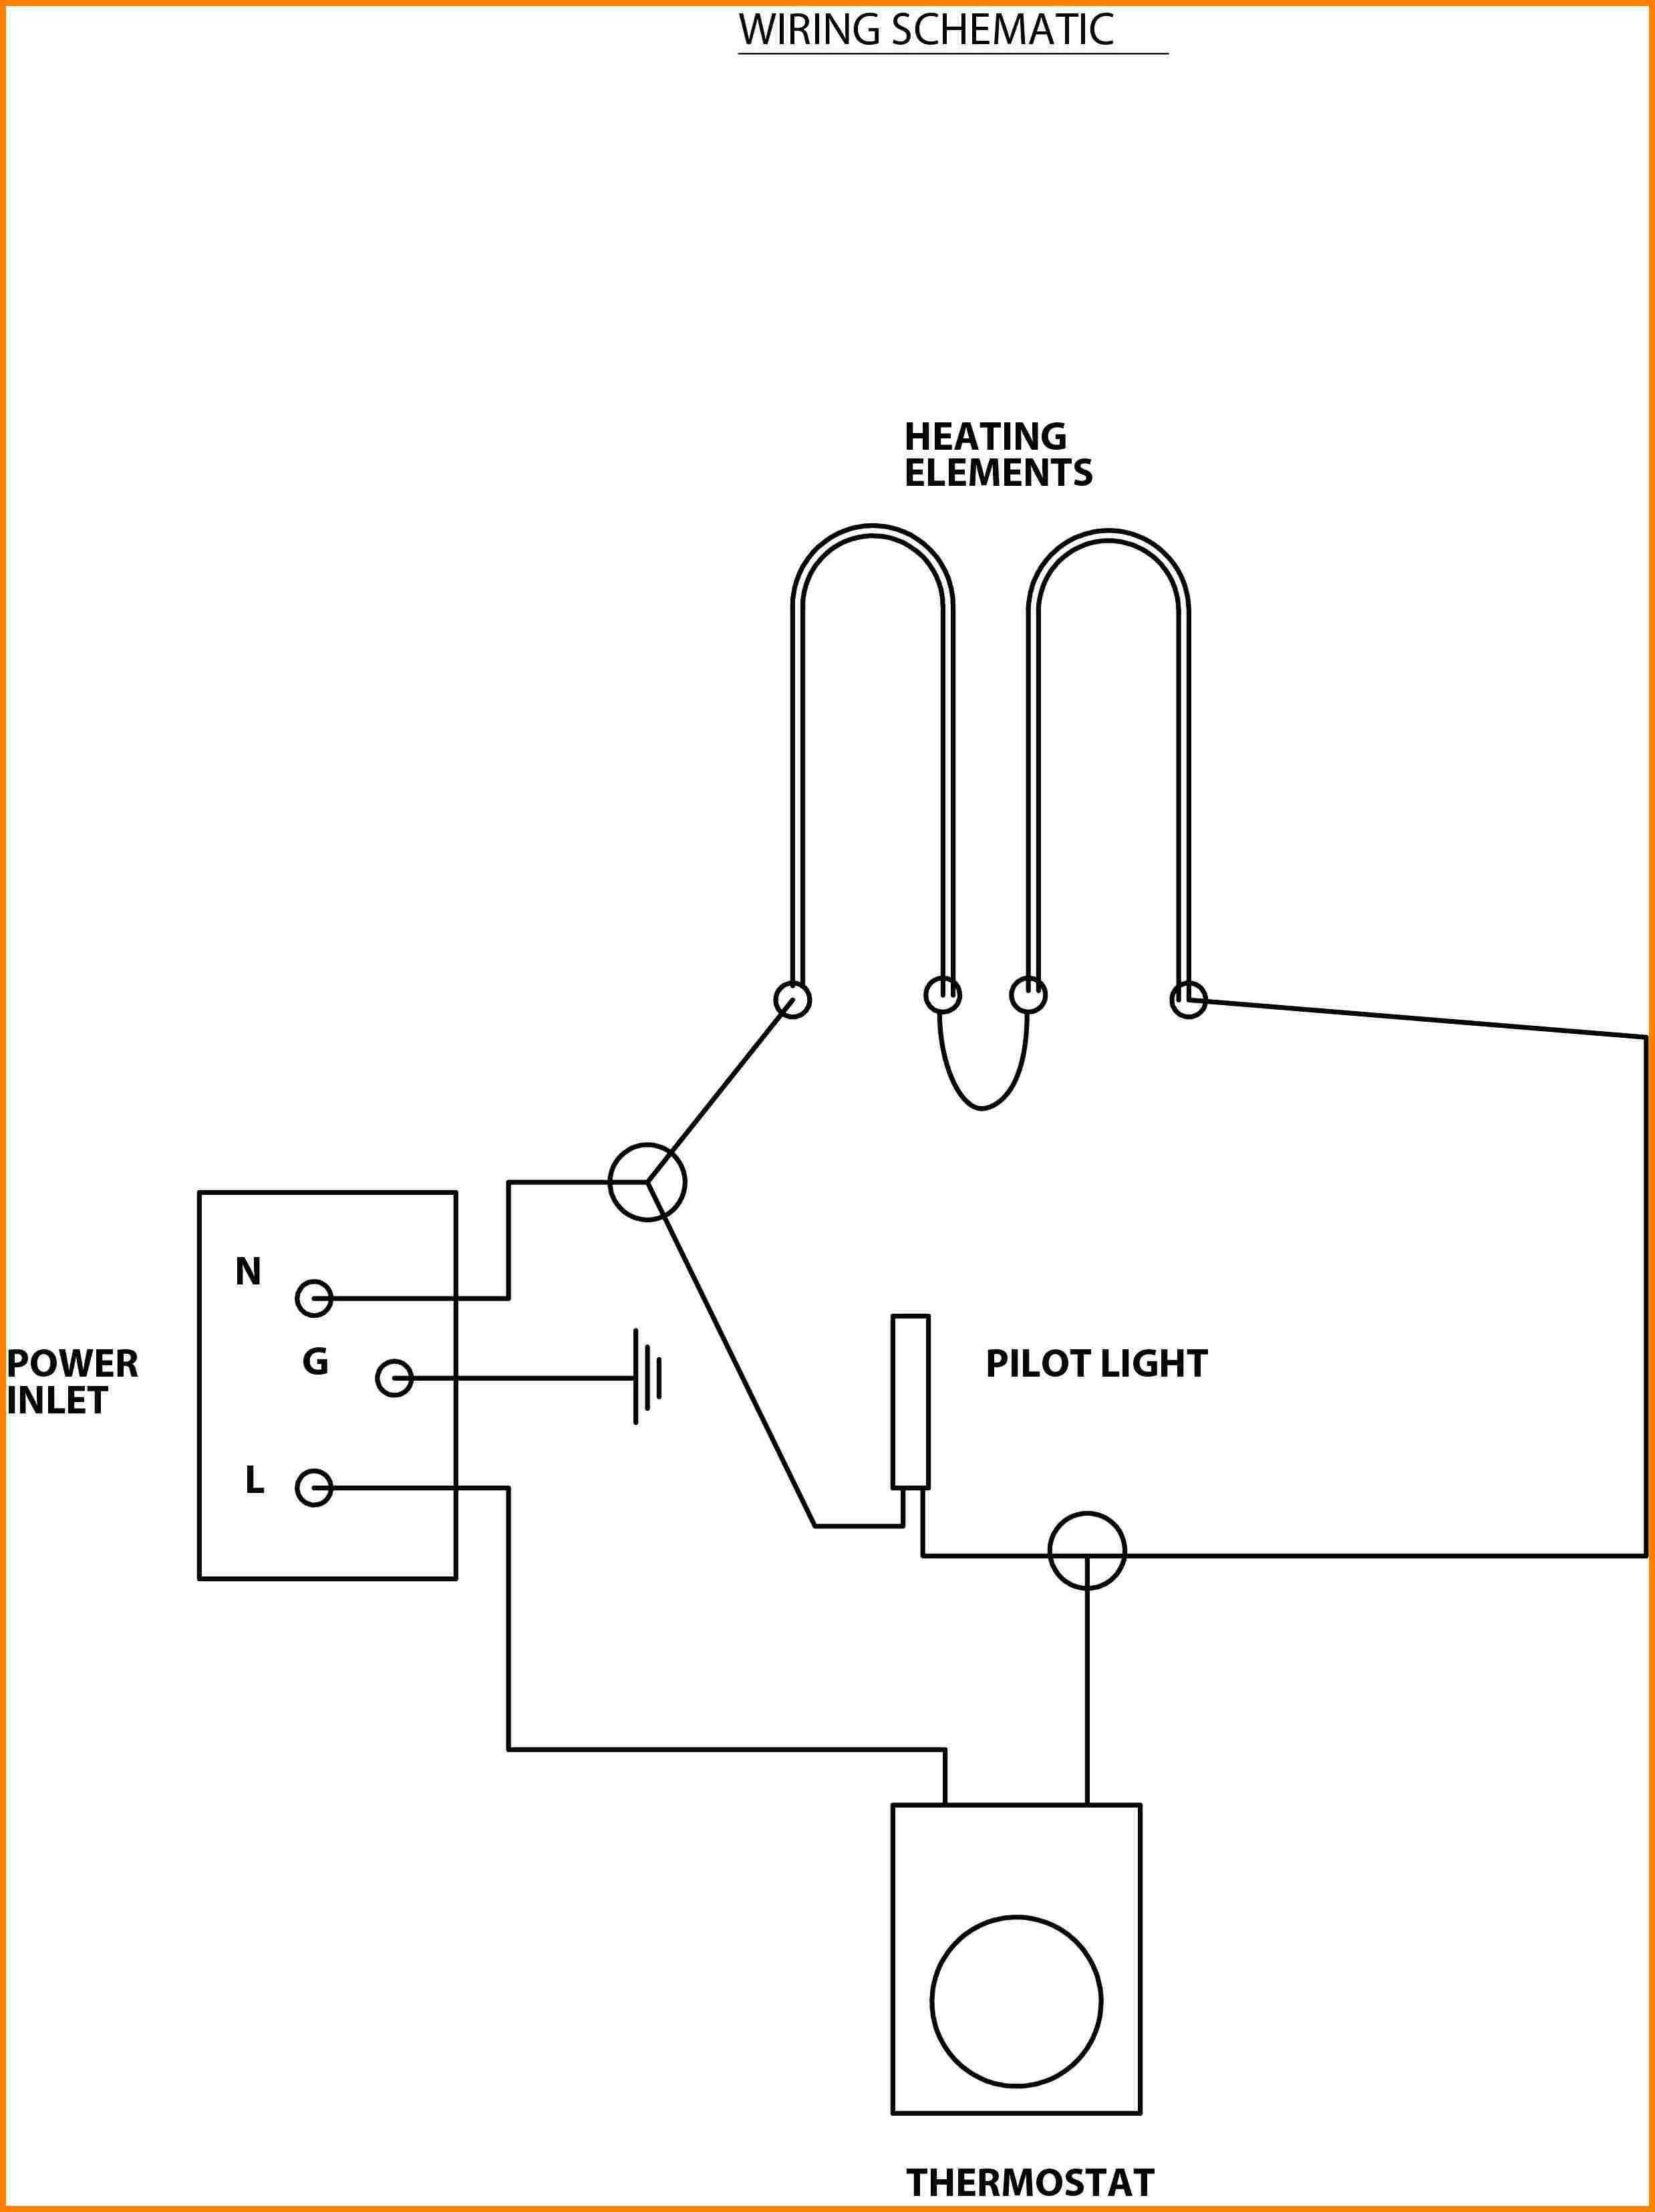 Wiring Diagram Heating Element Water Heater